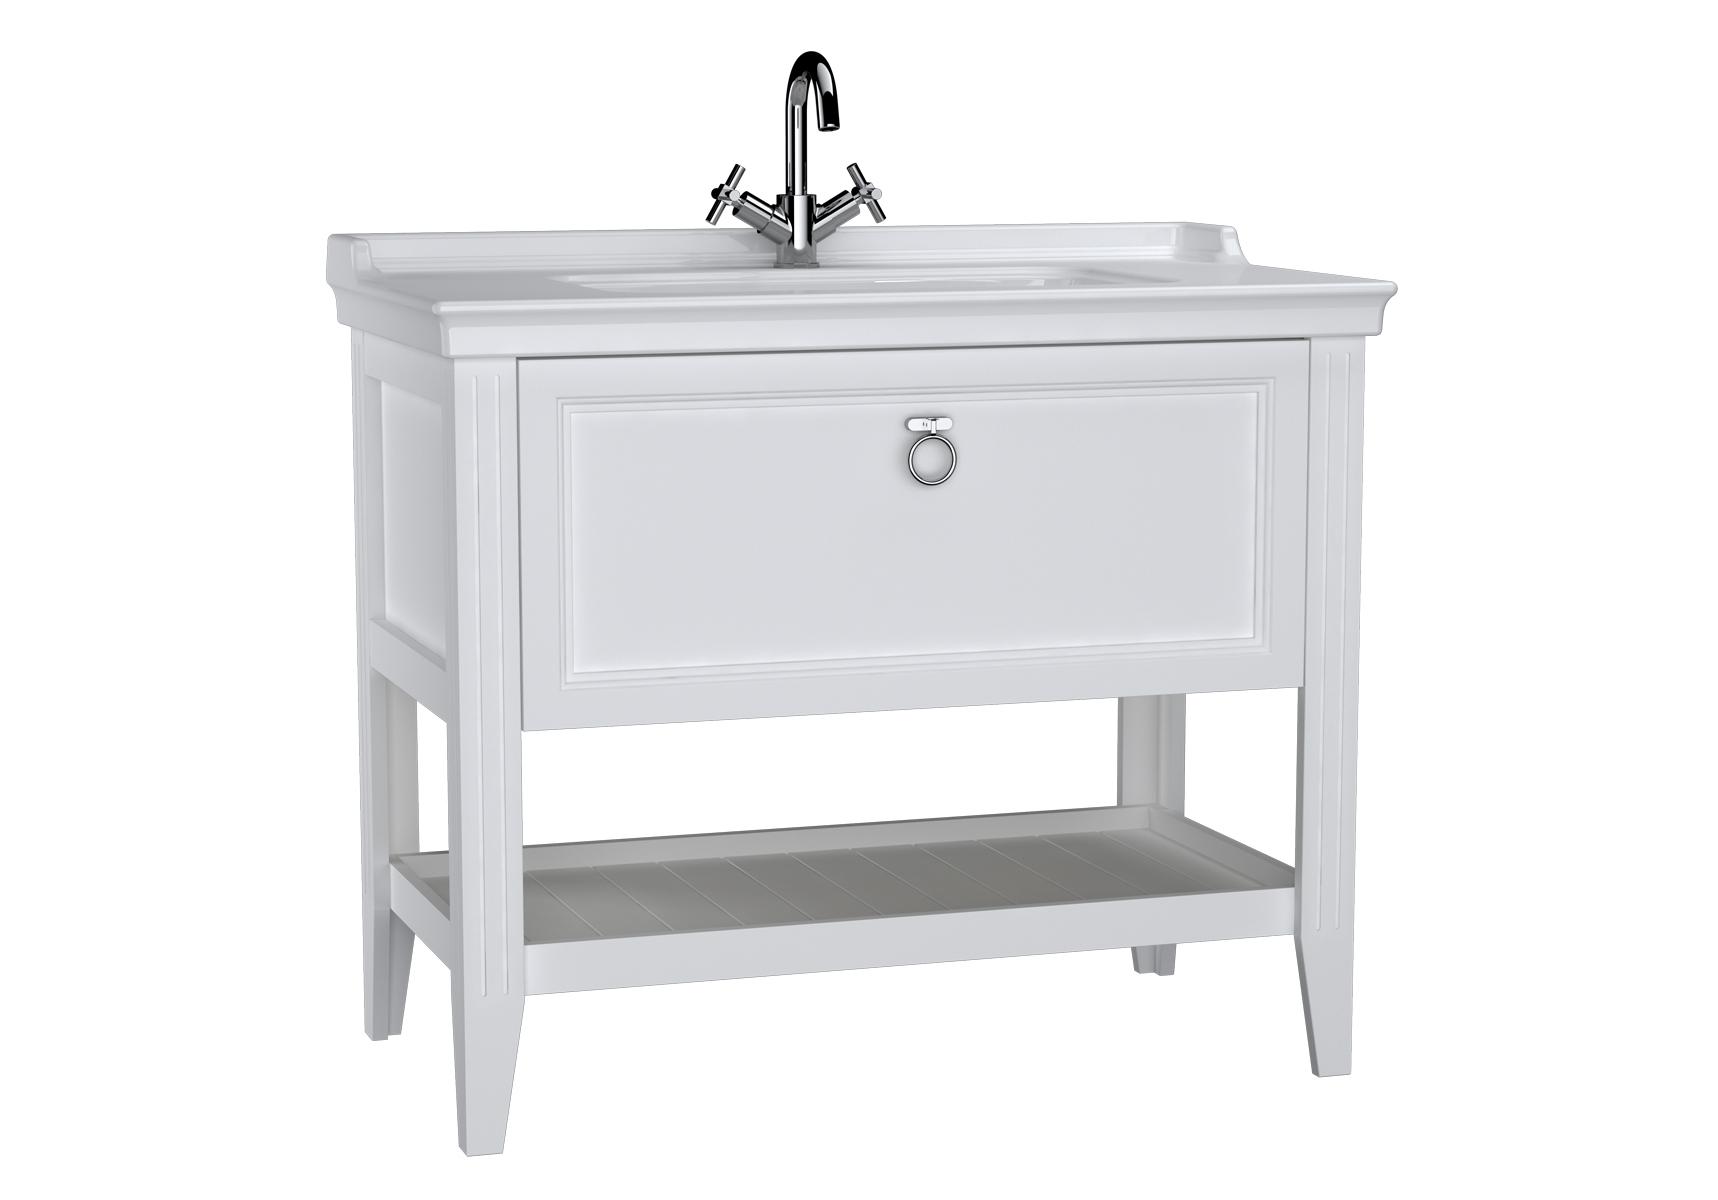 Valarte meuble avec plan céramique, 100 cm, avec tiror, blanc mat